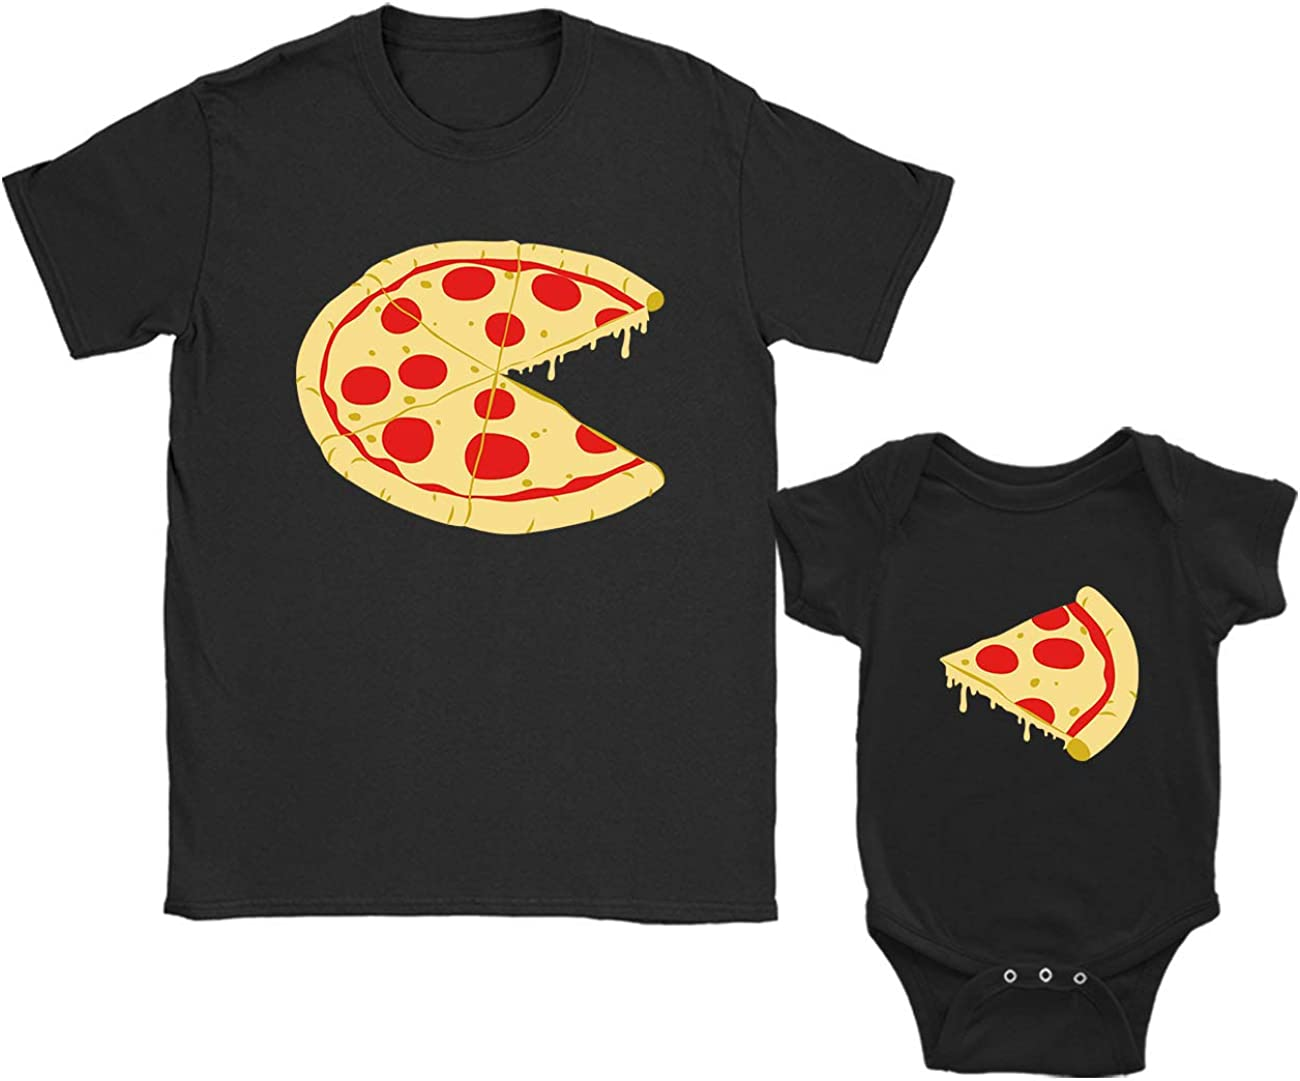 Green Turtle T-Shirts Regalos para Papas Primerizos, Camiseta Padre e Hijo Pizza